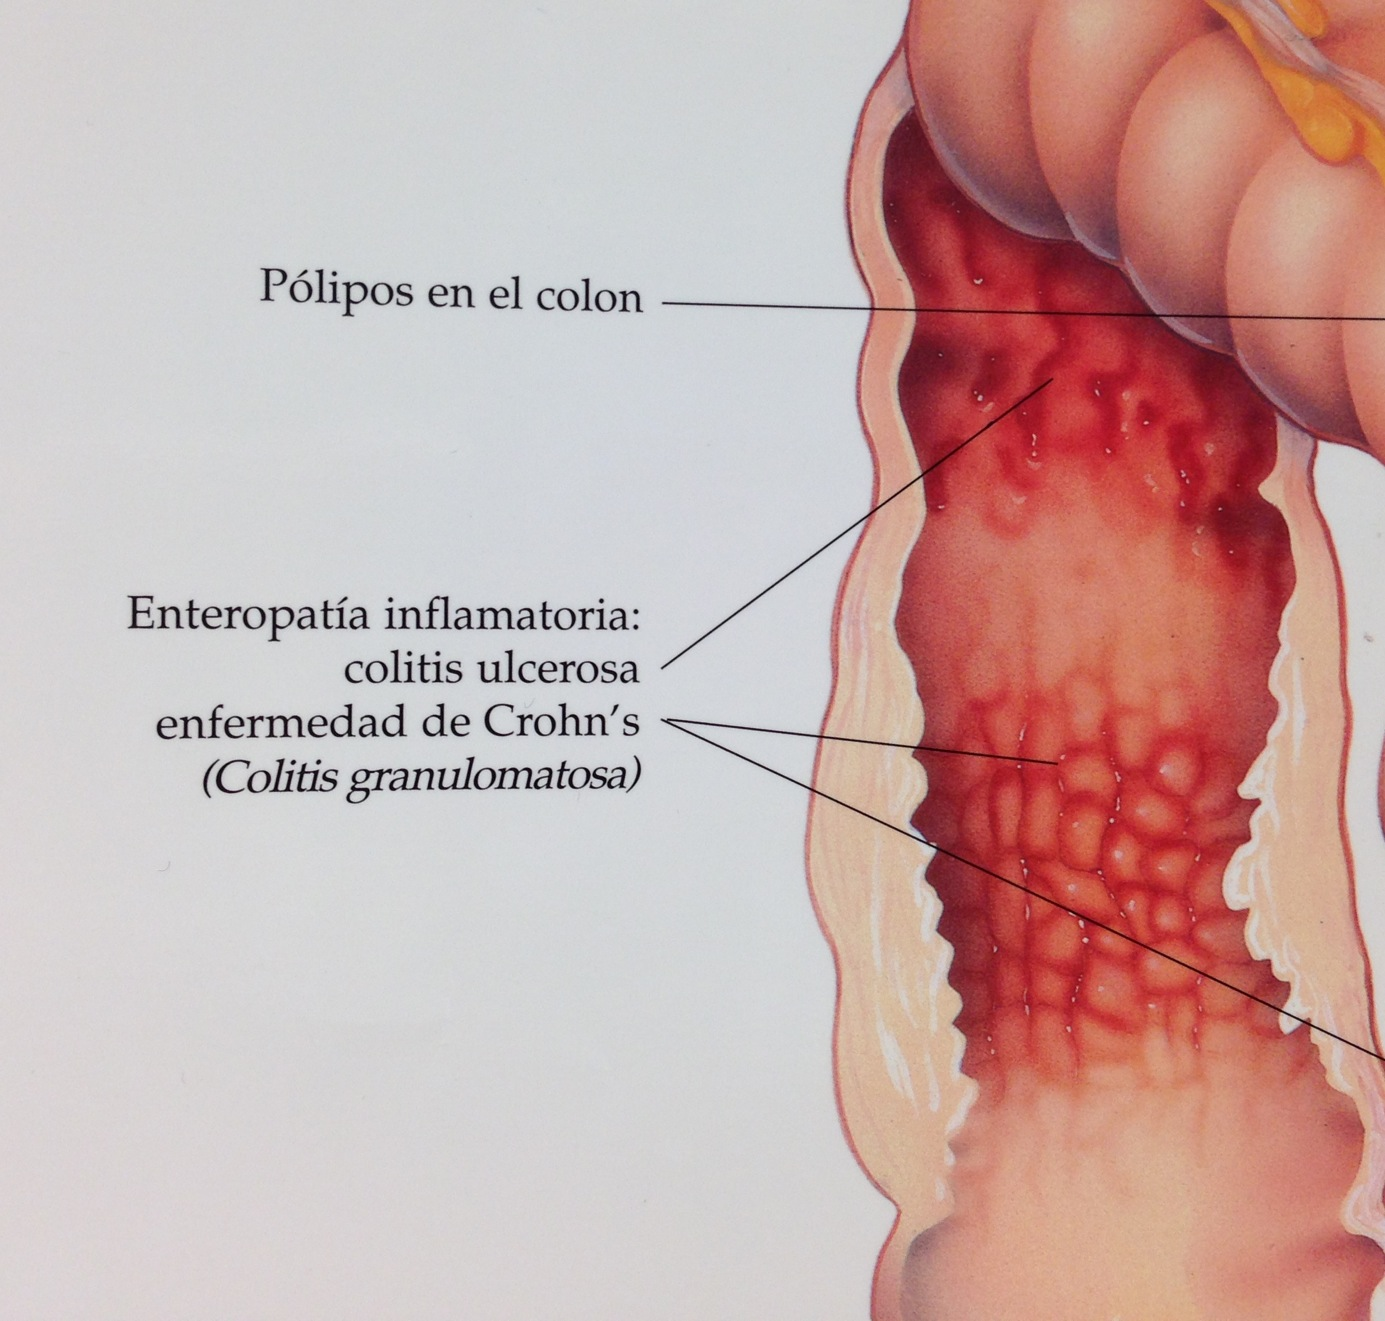 How do you say \'Crohn\'s\' in Spanish? | The Stolen Colon | ostomy ibd ...